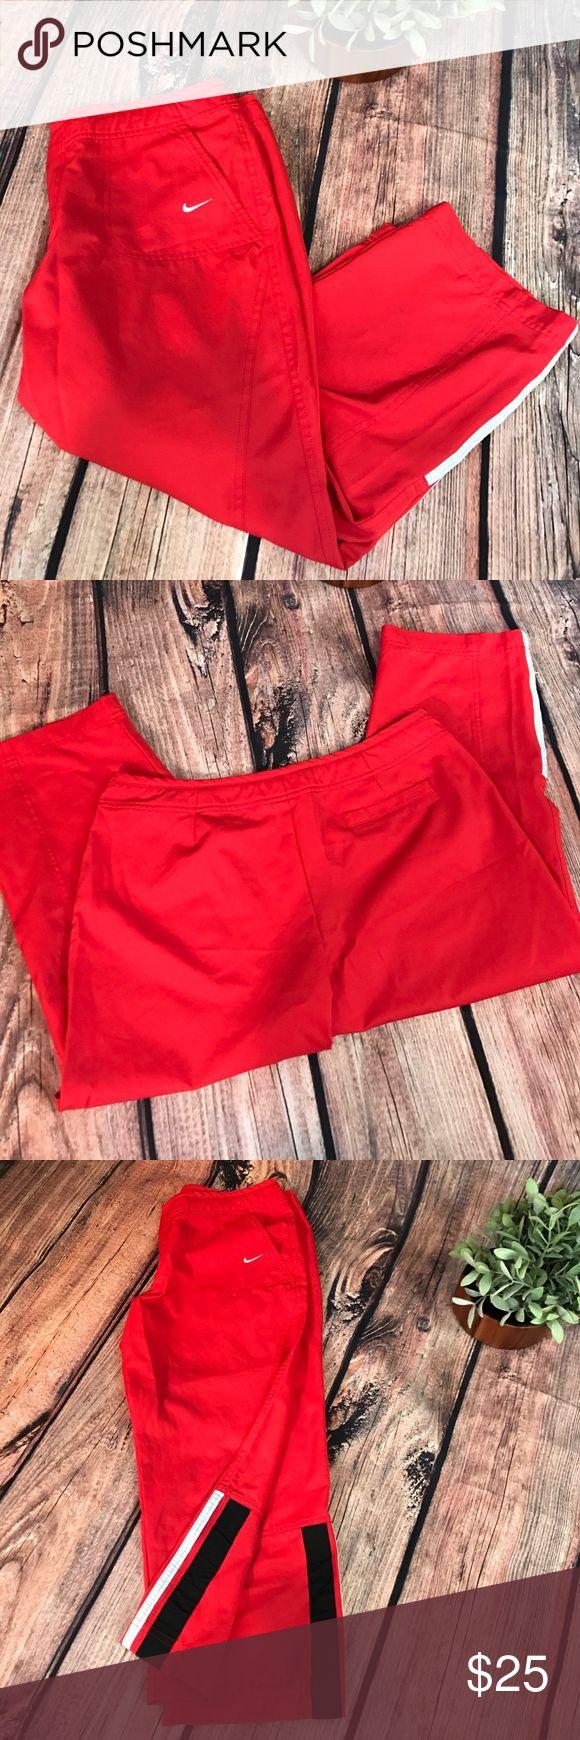 "Nike Capri pants Red Nike Capri pants.  30"" long. Missing tags, see photos. Used condition Nike Pants"